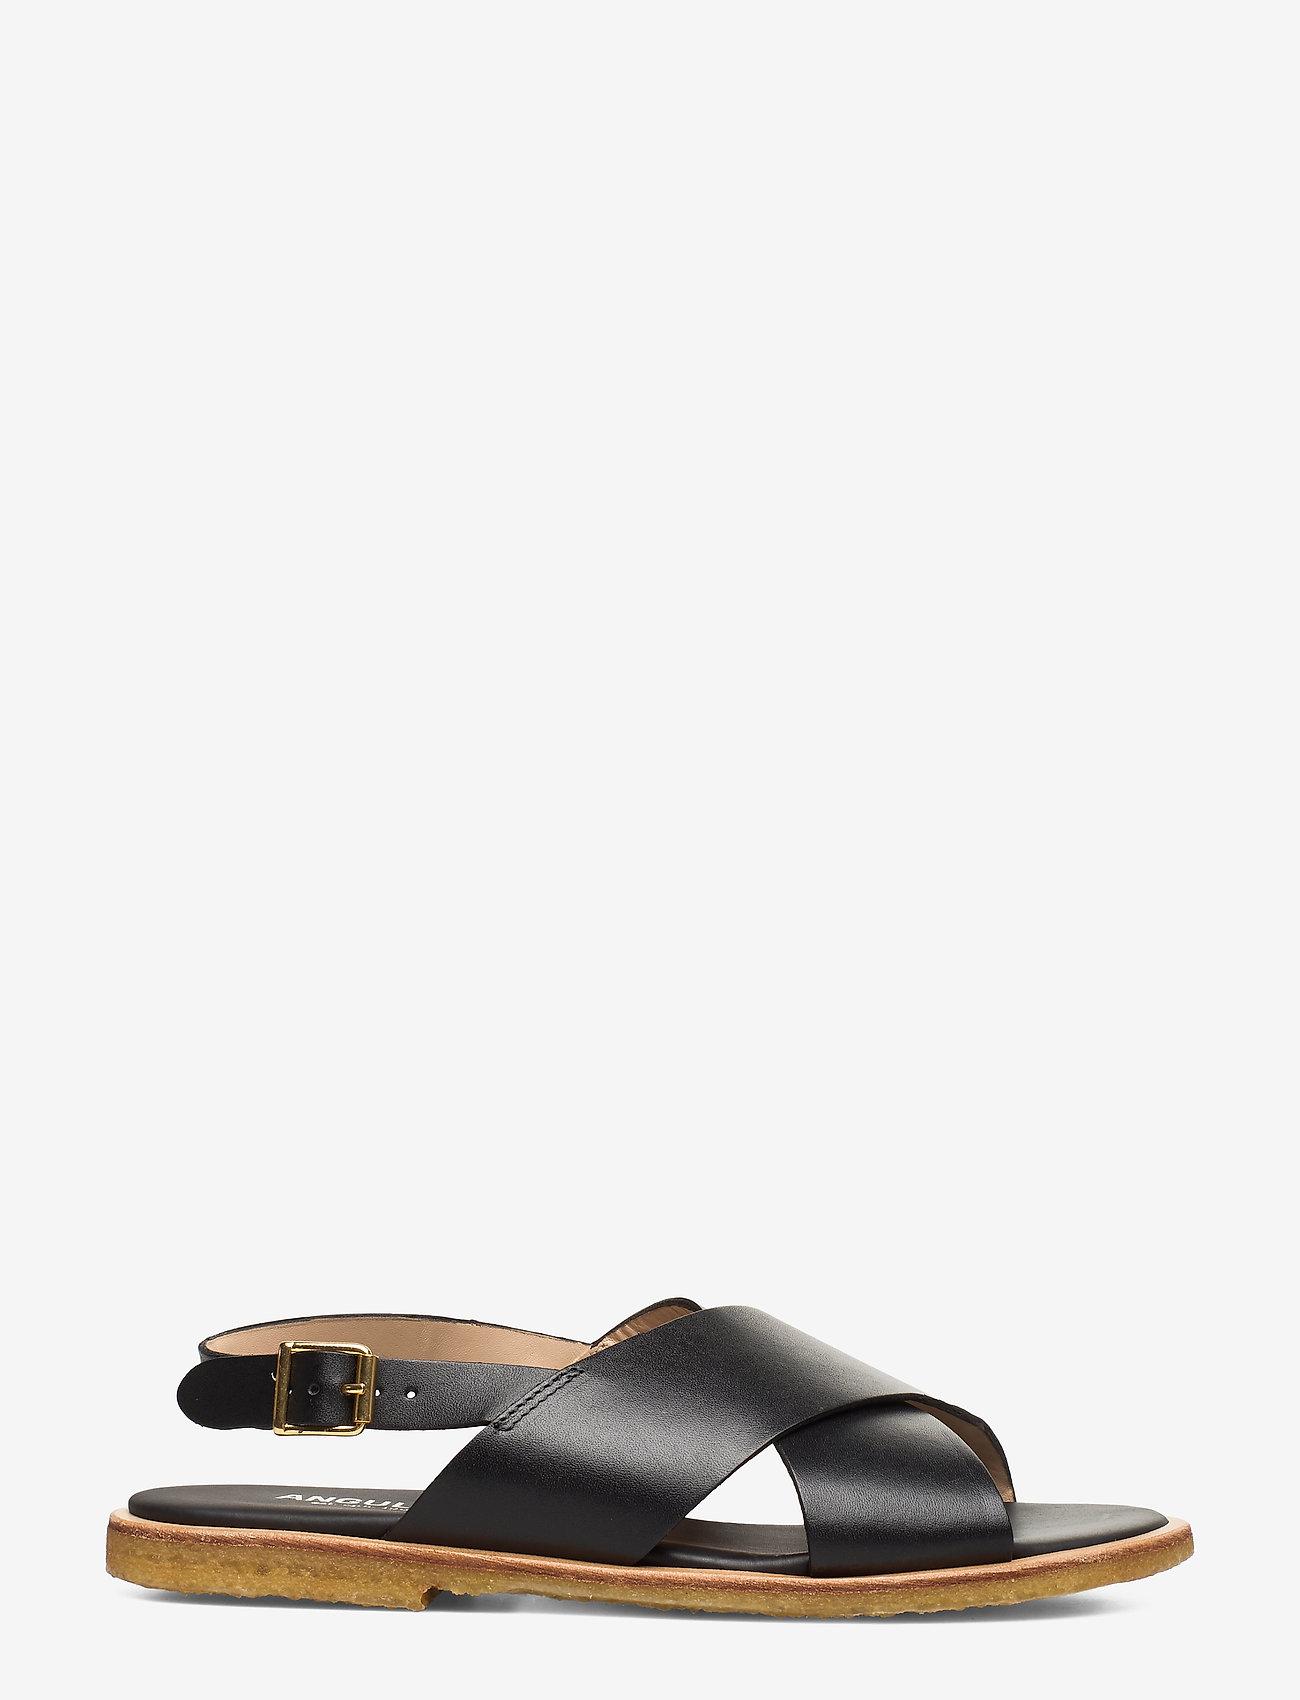 ANGULUS - Sandals - flat - open toe - op - flache sandalen - 1785 black - 1